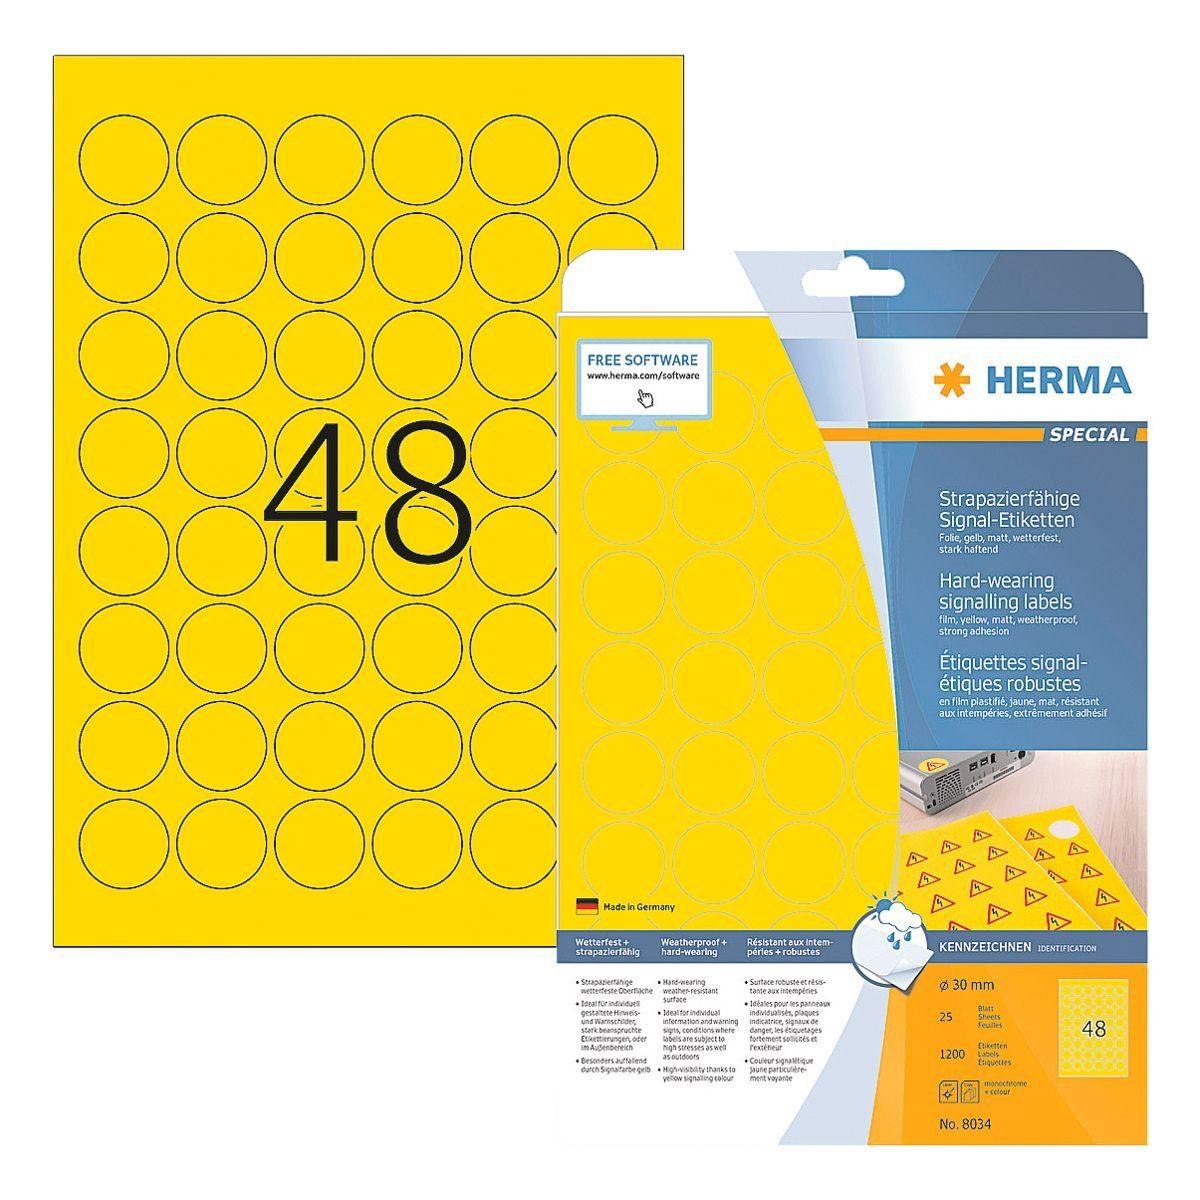 HERMA Outdoor Folien-Etiketten 1200 Stück »Special«